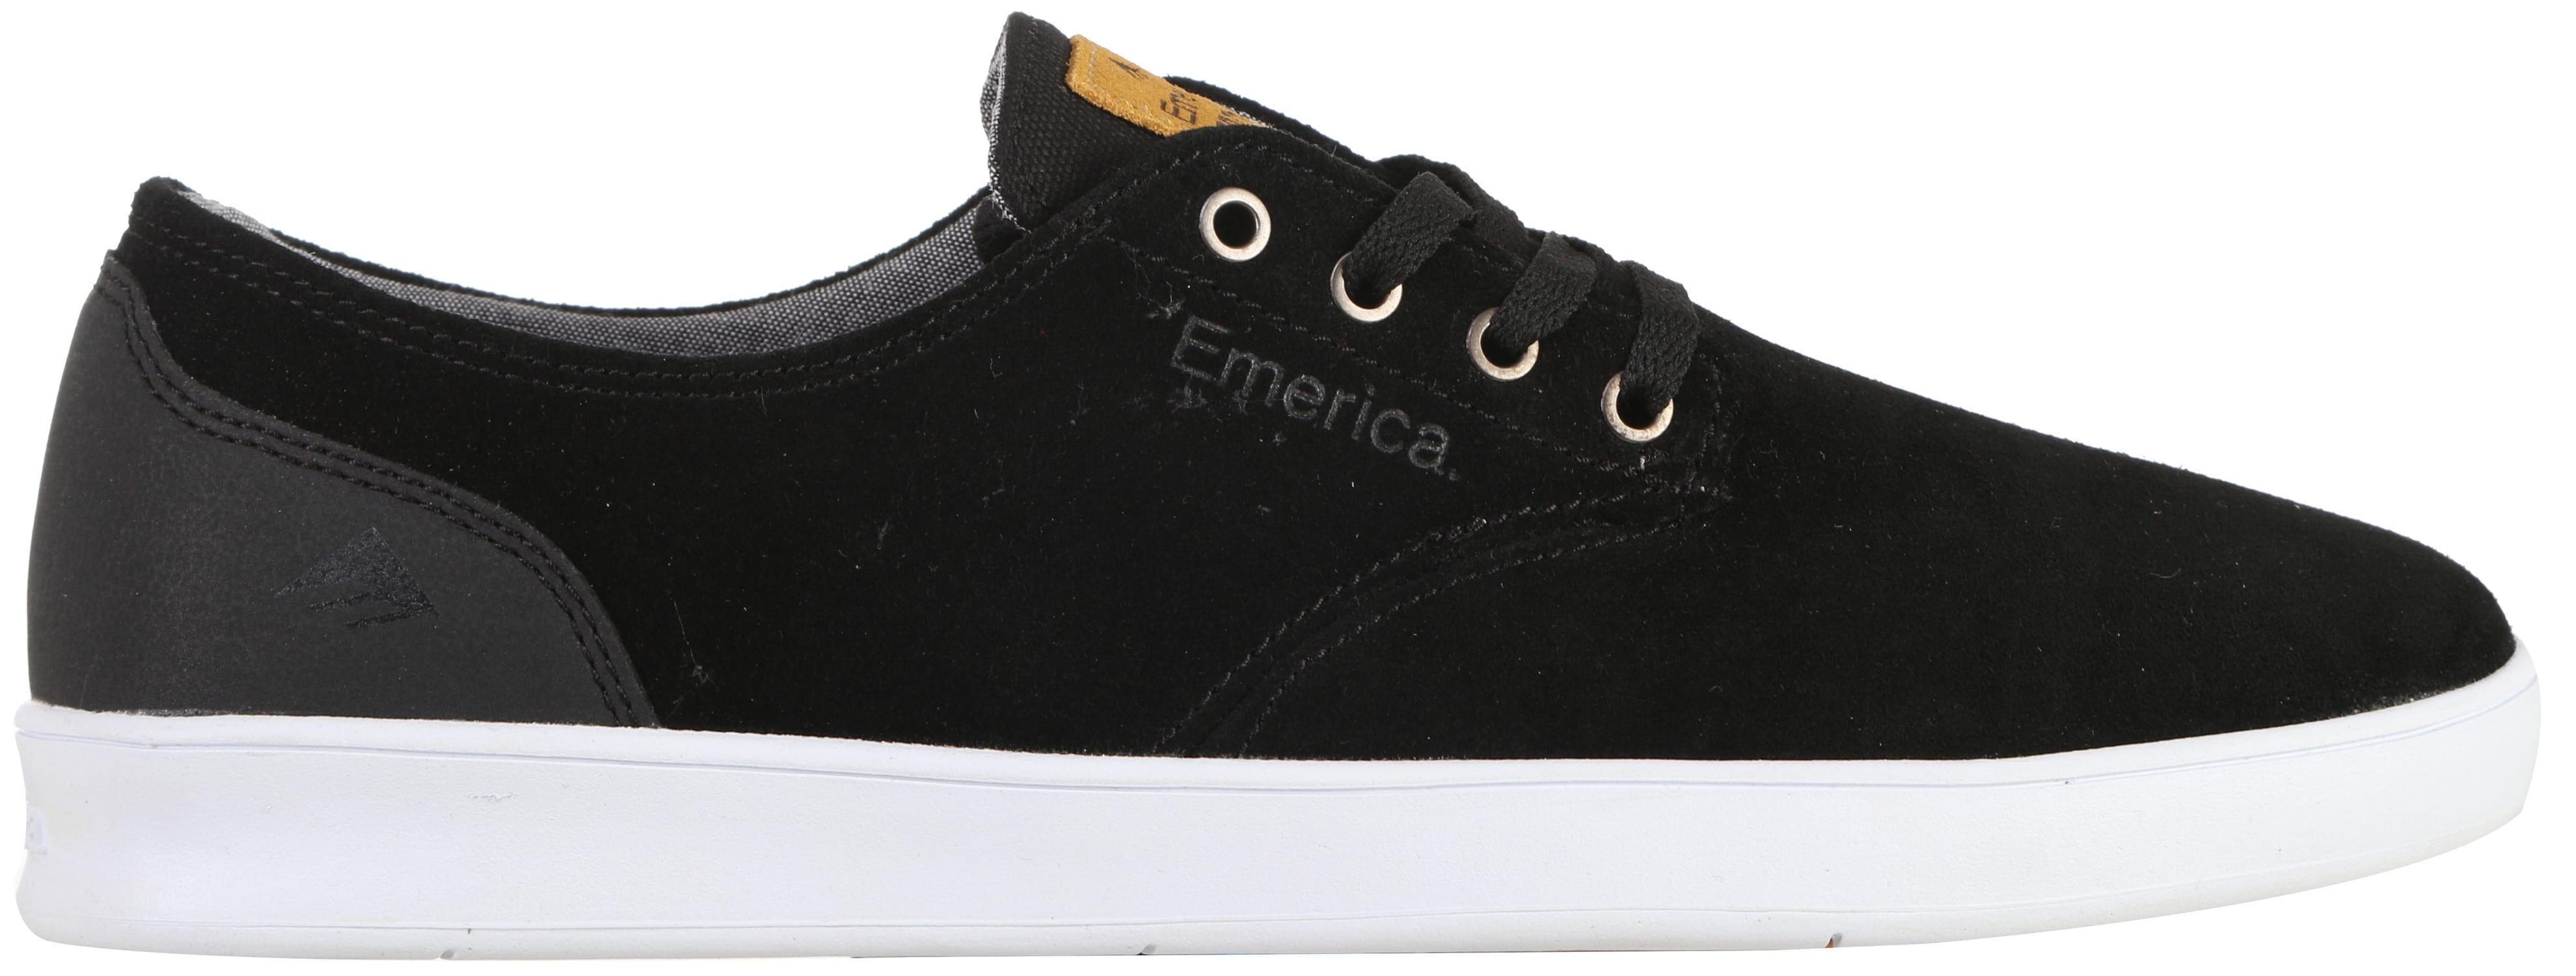 Emerica Shoes Romero Laced Price